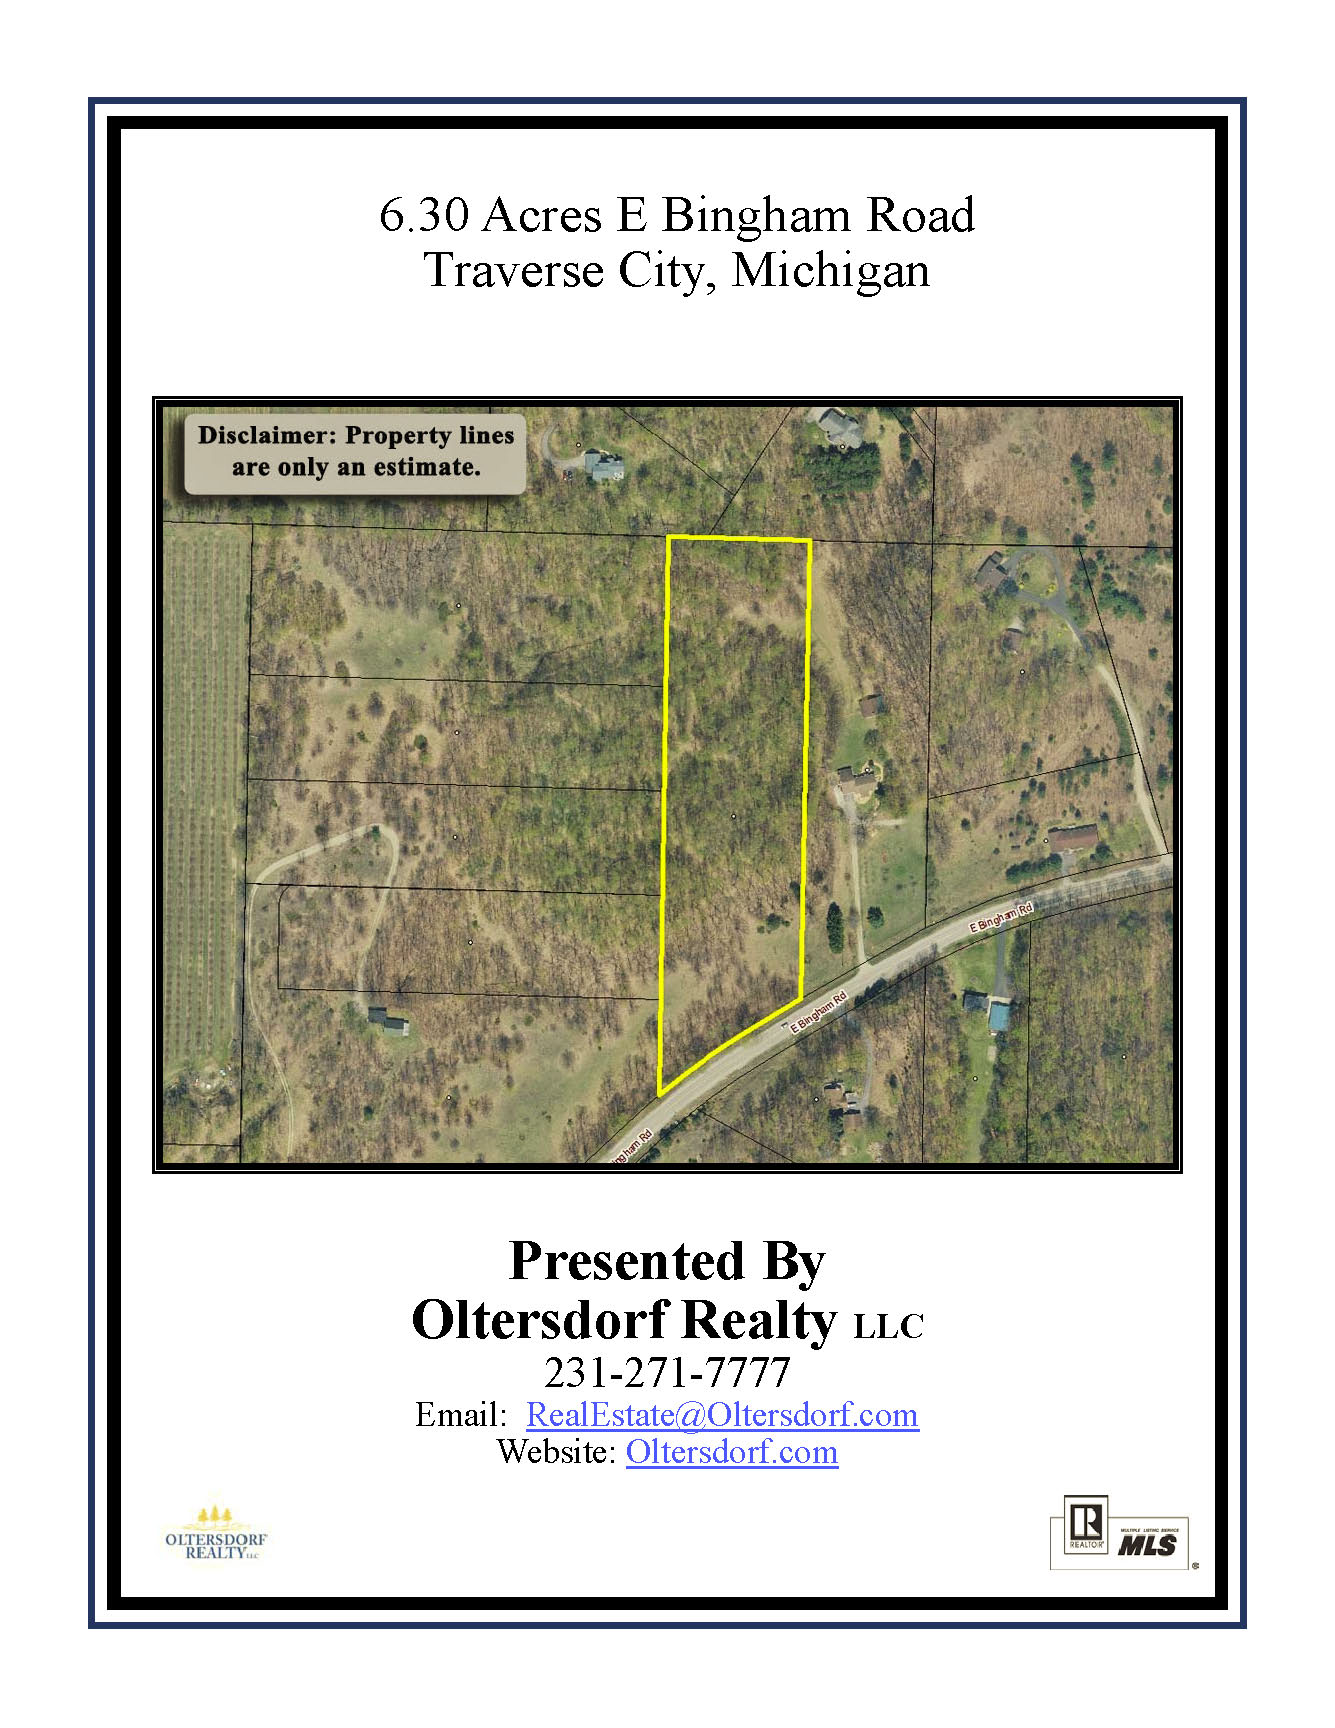 6.30 Acres – E Bingham Road, Traverse City - Marketing Packet by Oltersdorf Realty LLC (1).jpg